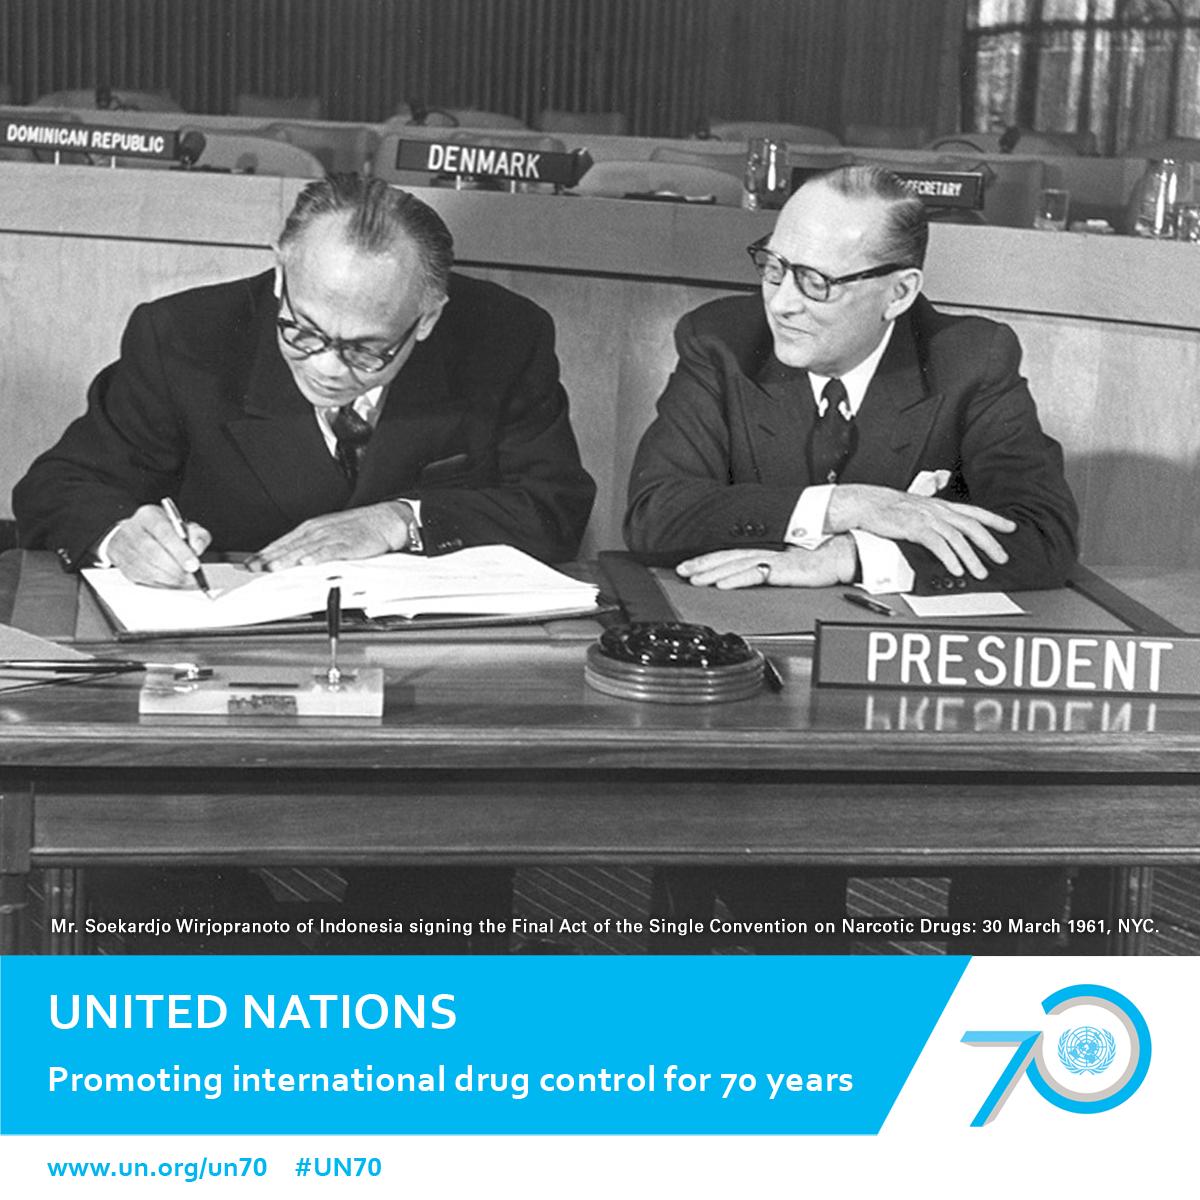 United Nations Quietly Pushes International Gun Control